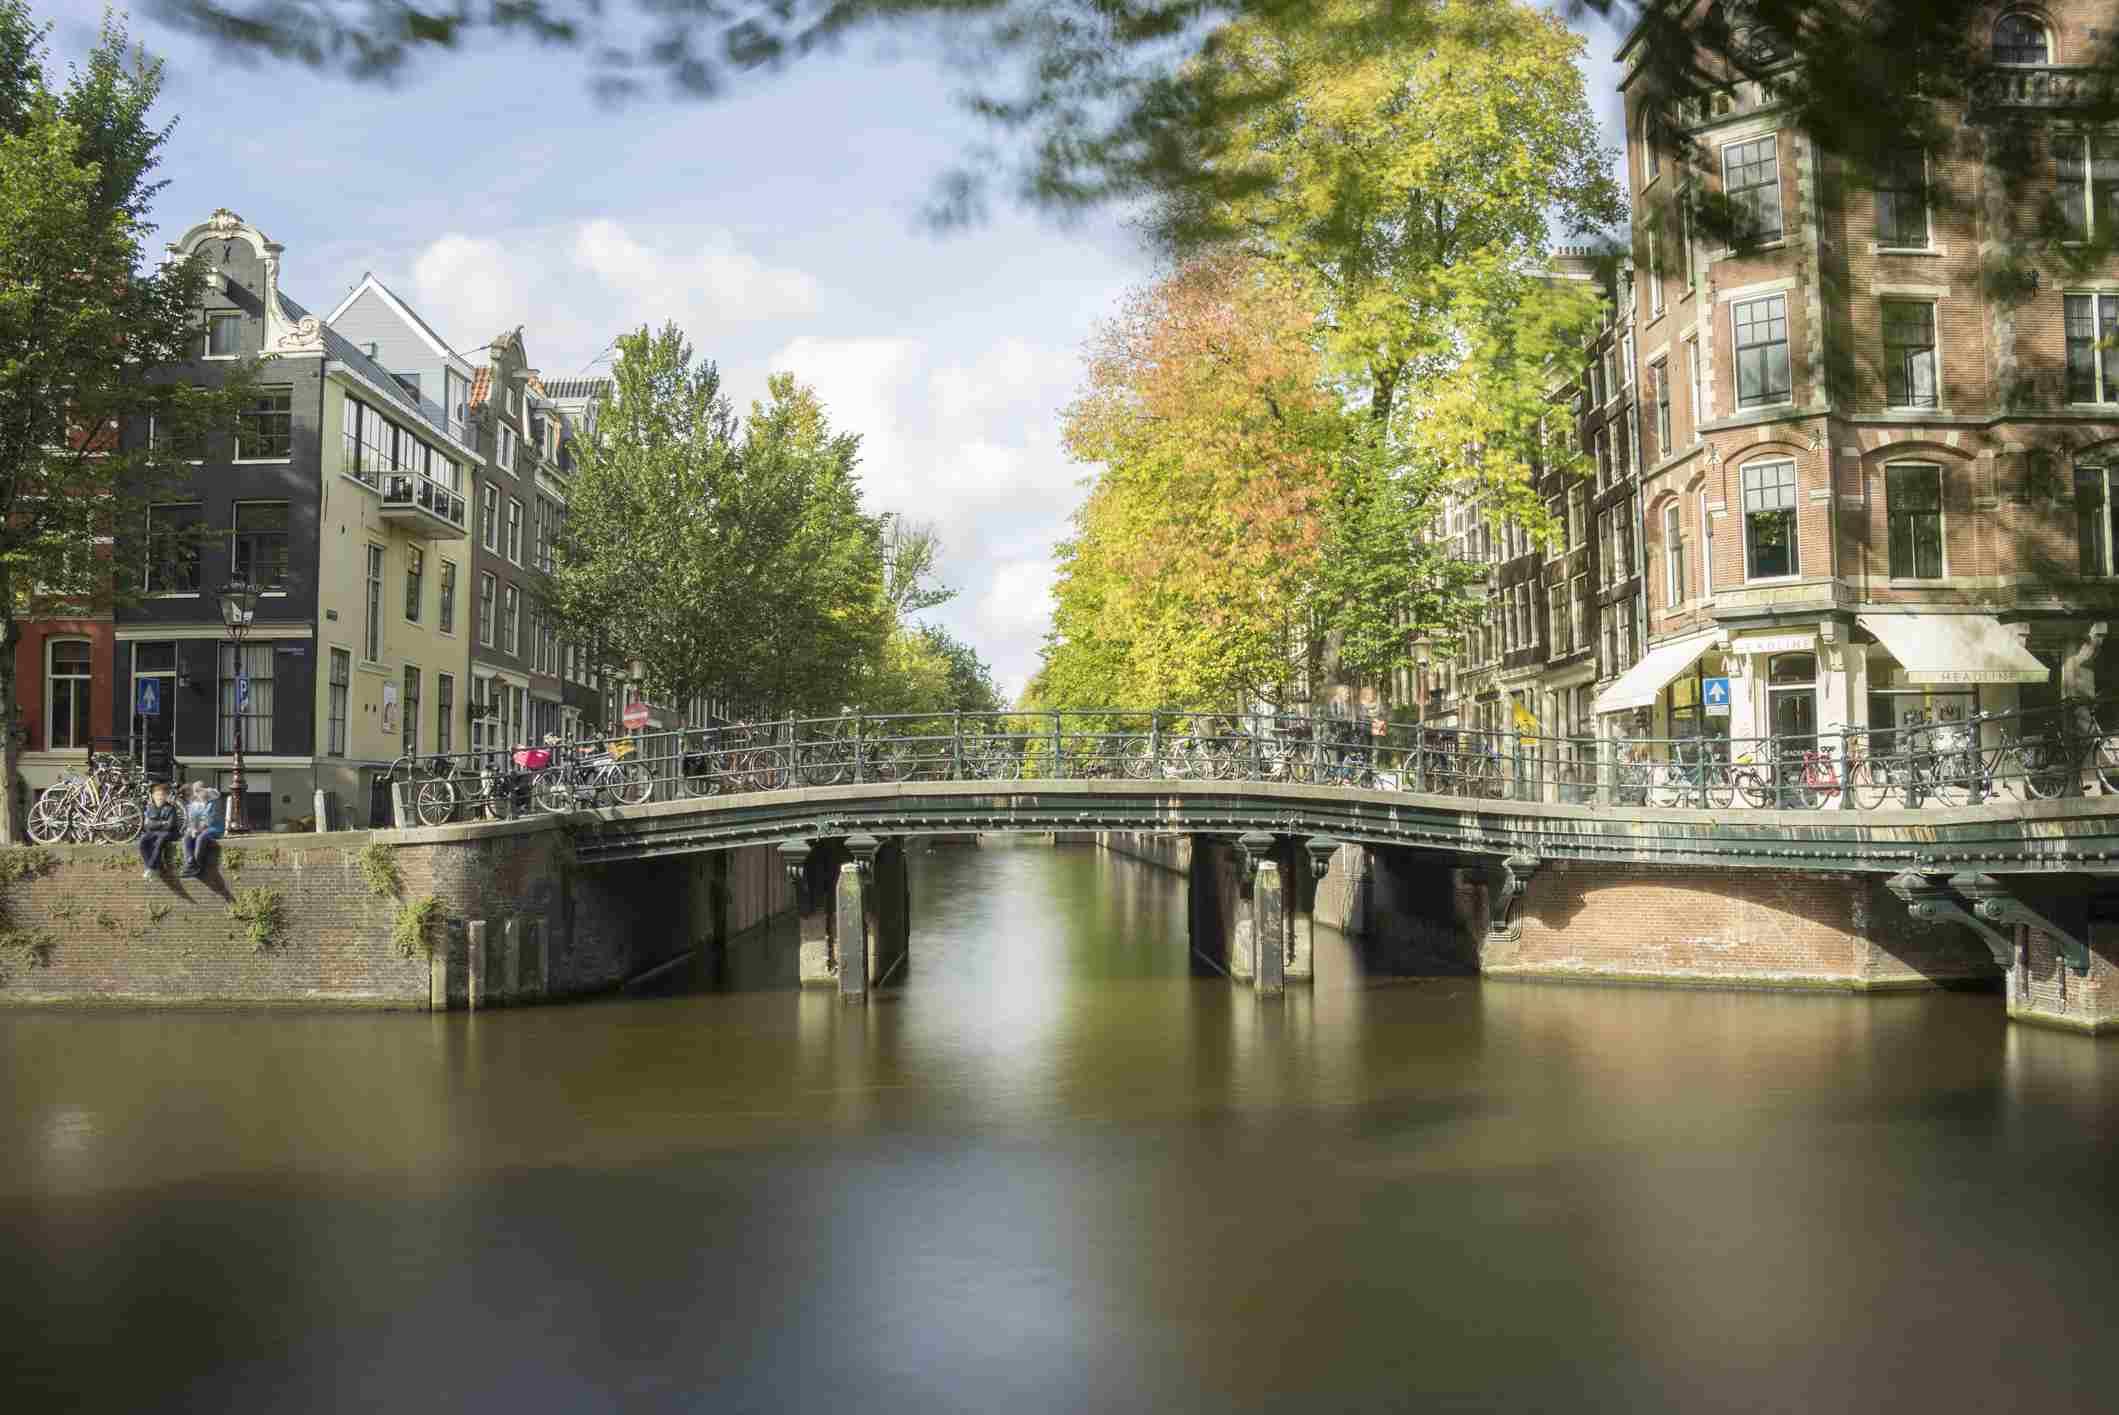 Bridge in Herengracht canal, Amsterdam